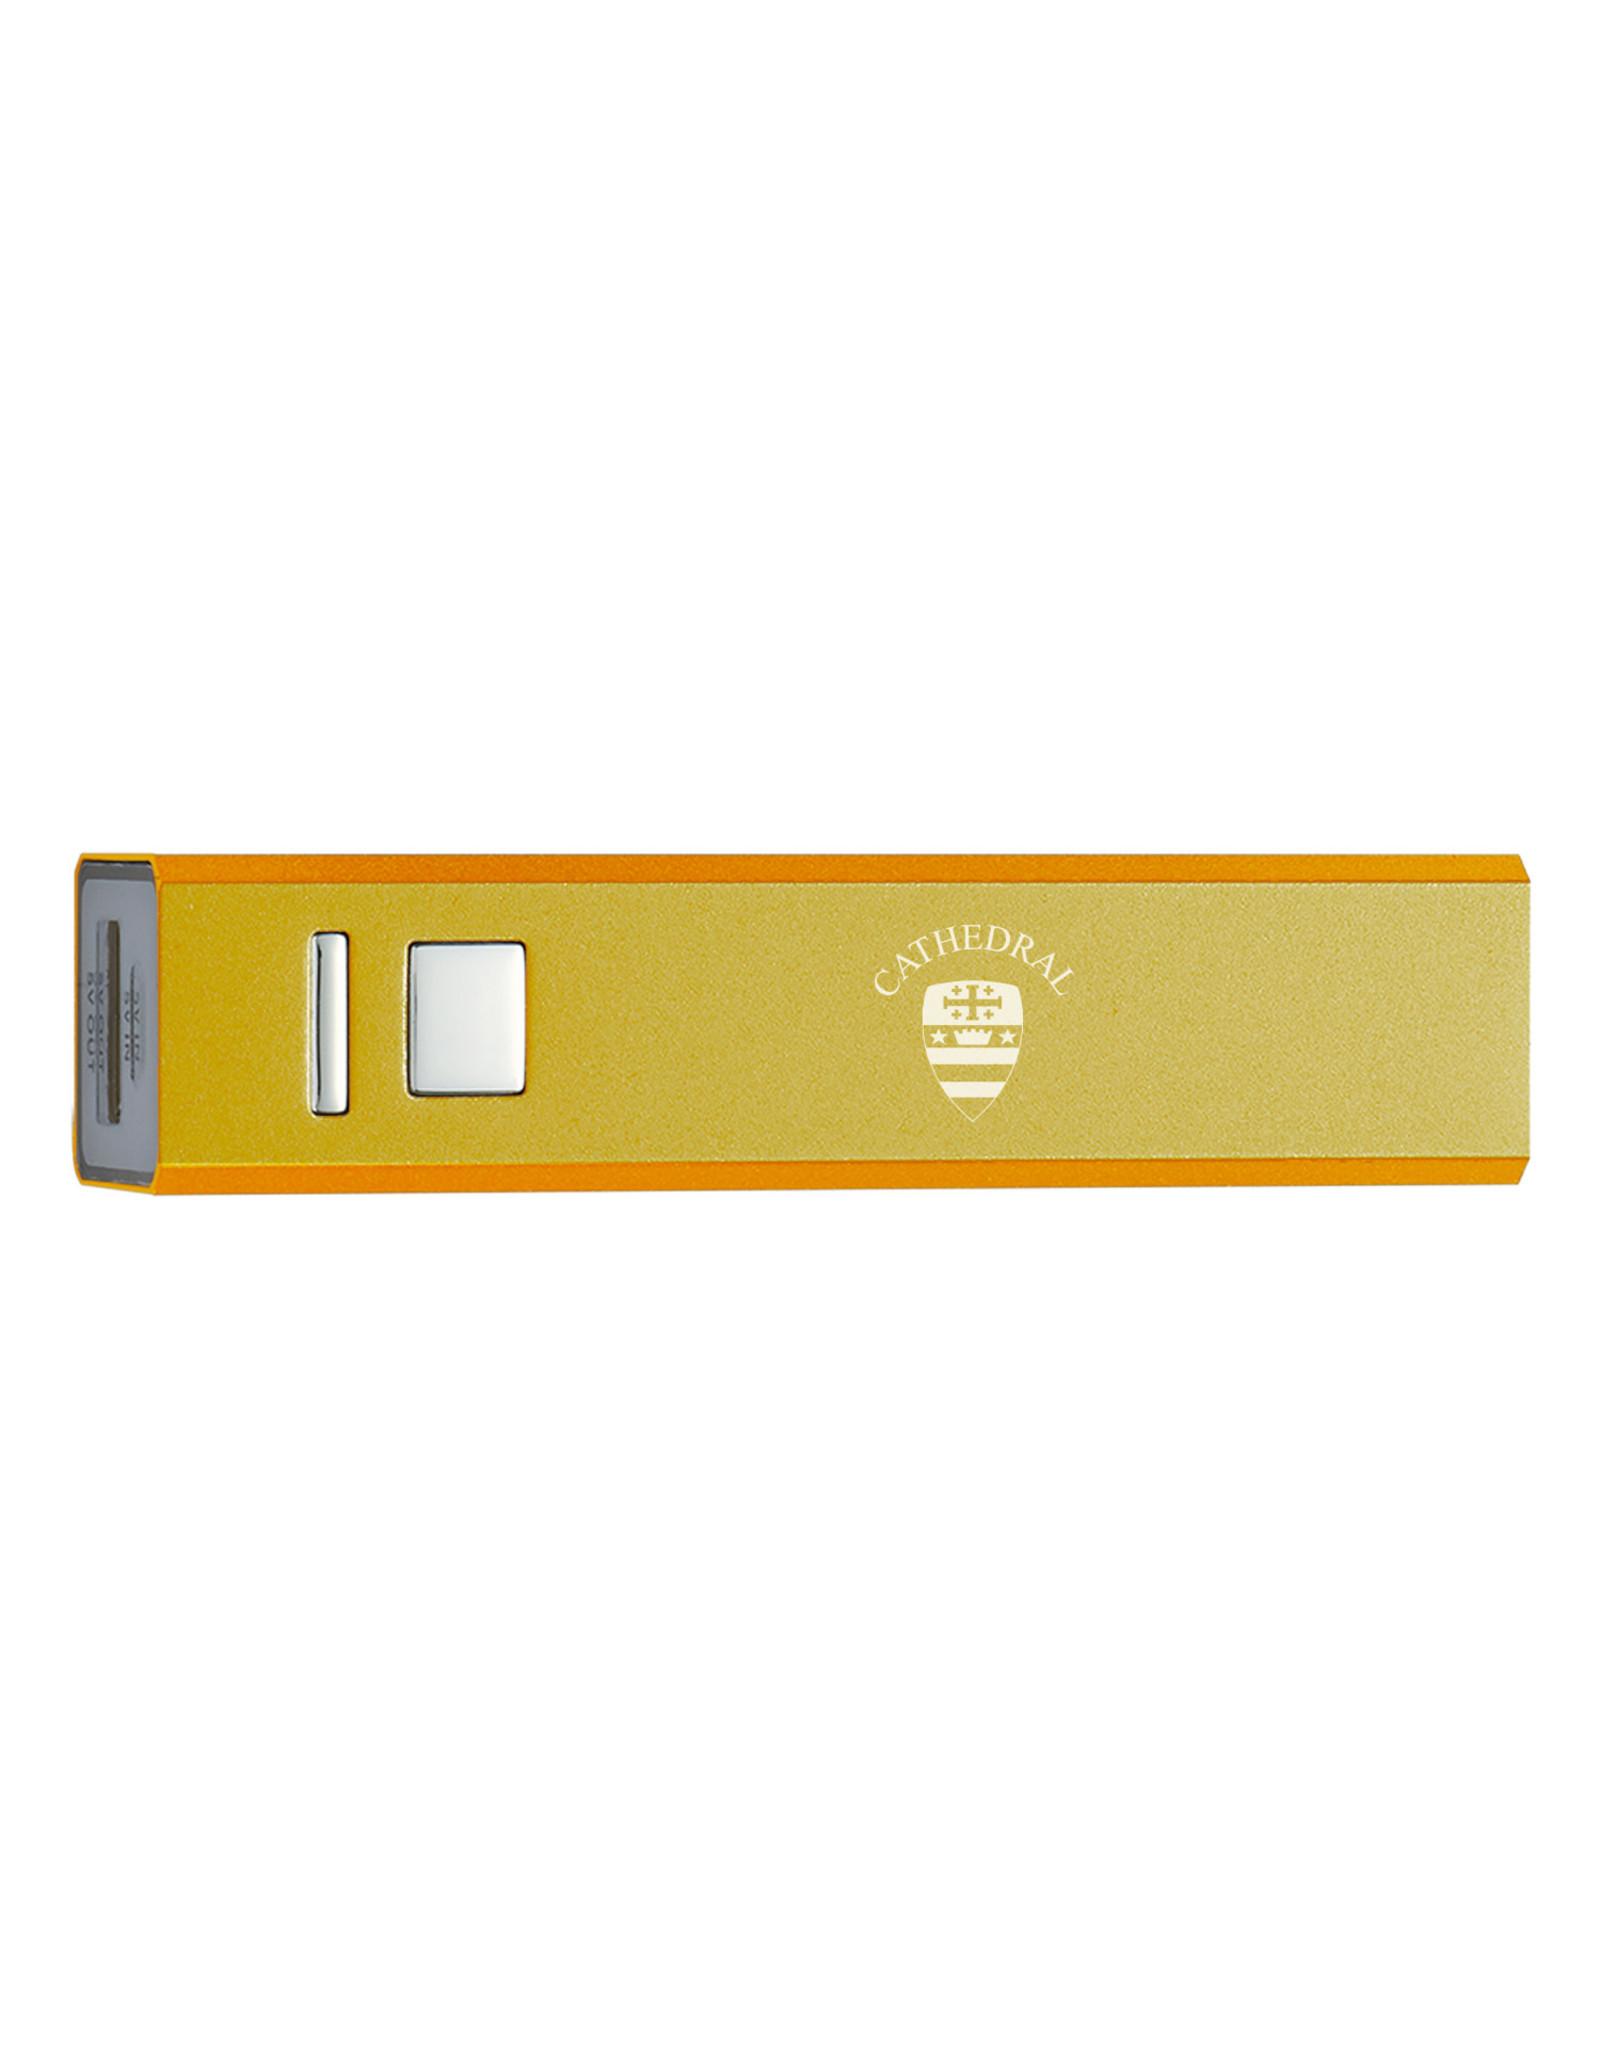 POWER BANK-NCS GOLD